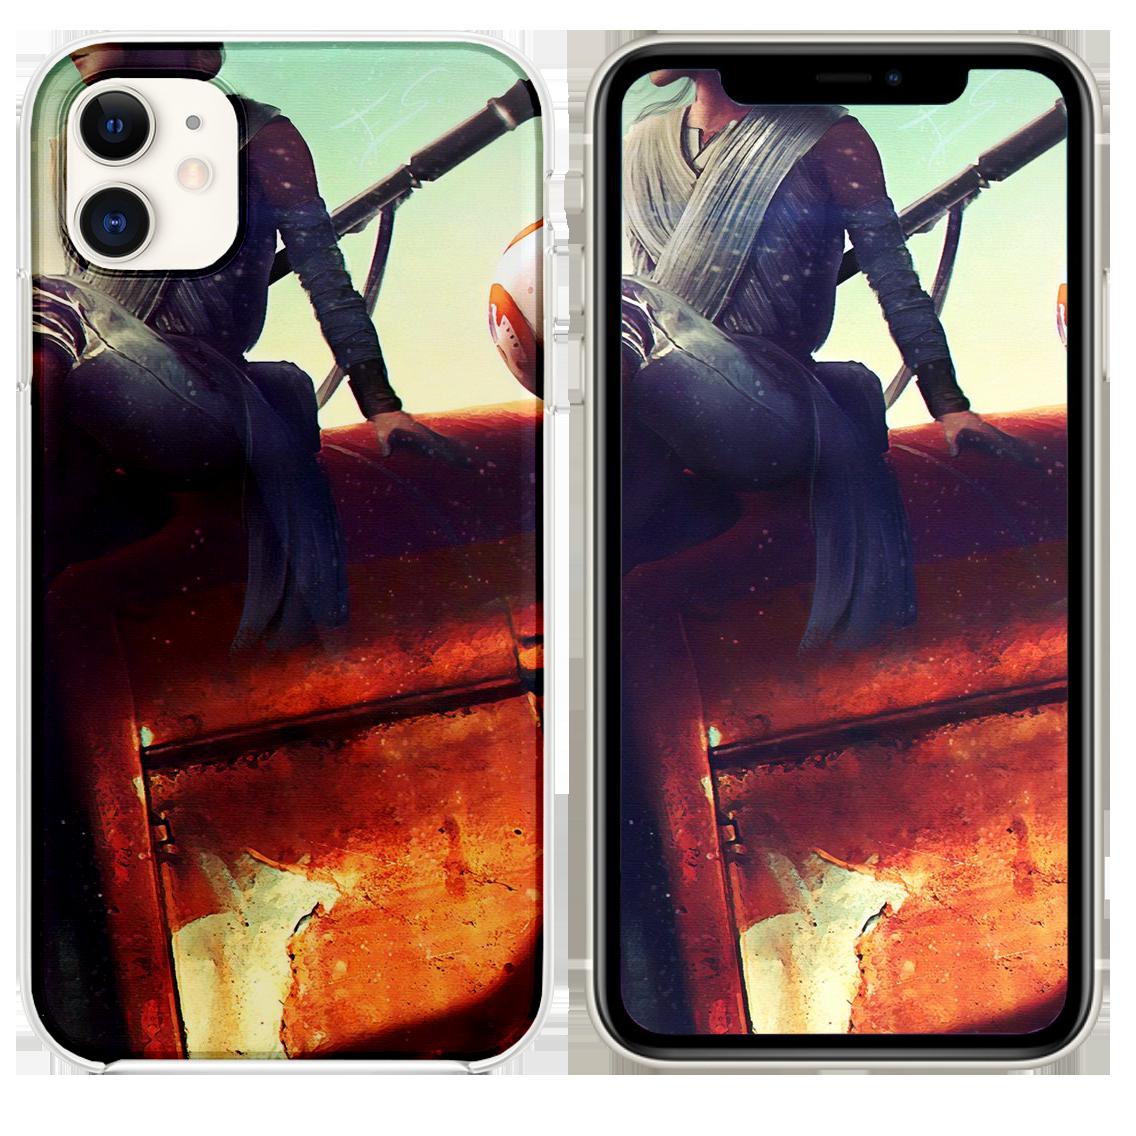 Star Wars The Force Awakens 4k Iphone 11 Case Iphone 11 Awakens